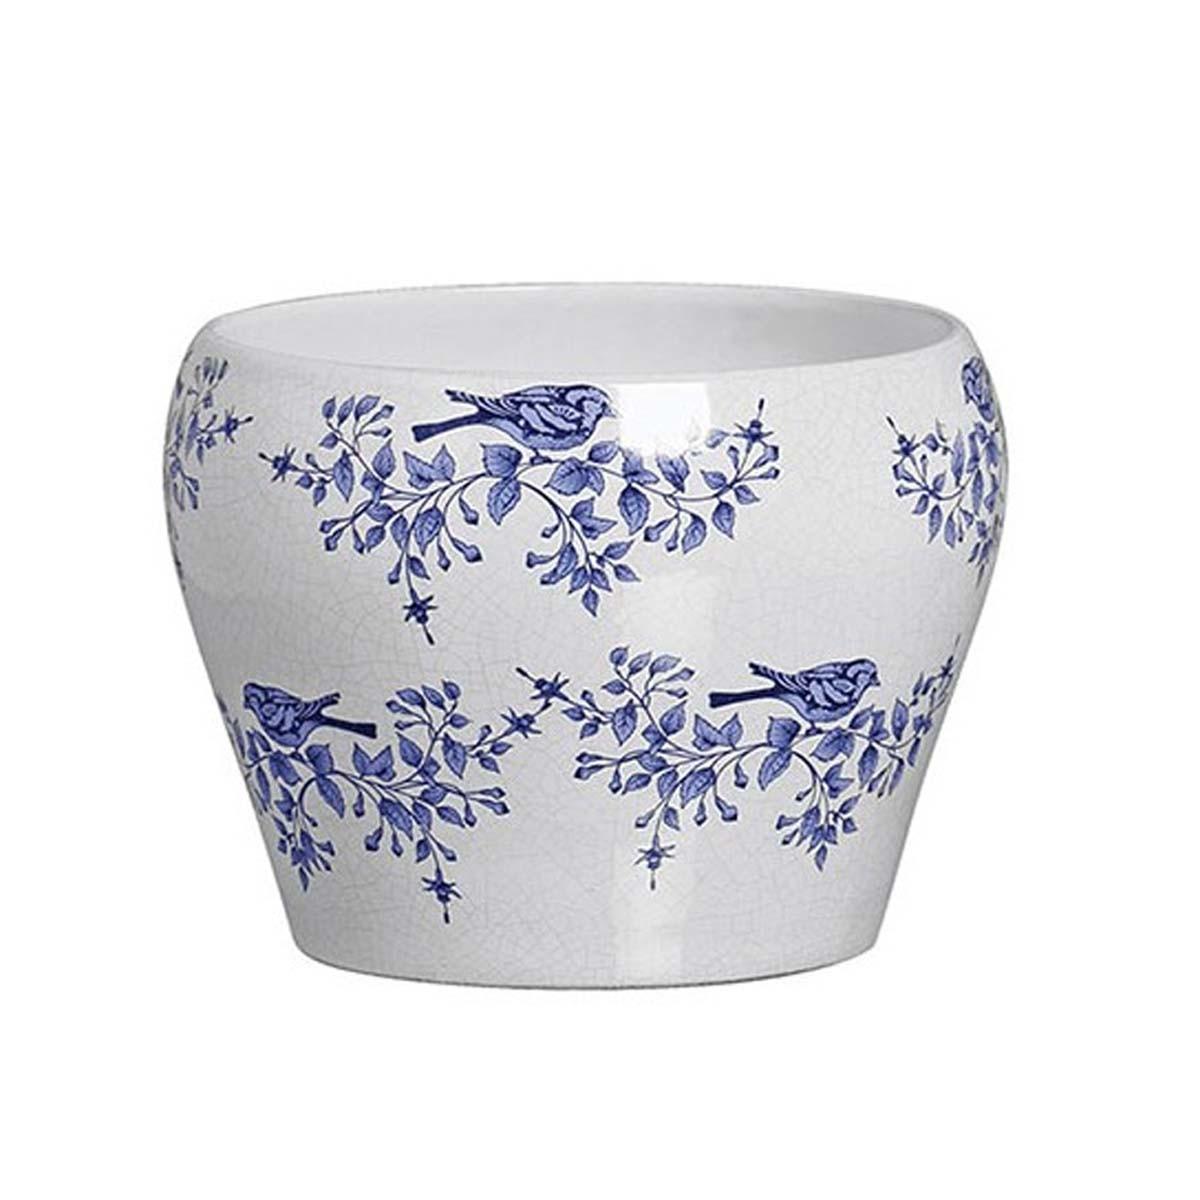 Cachepot de Cerâmica - Chinesa Victoria Branco 15cm